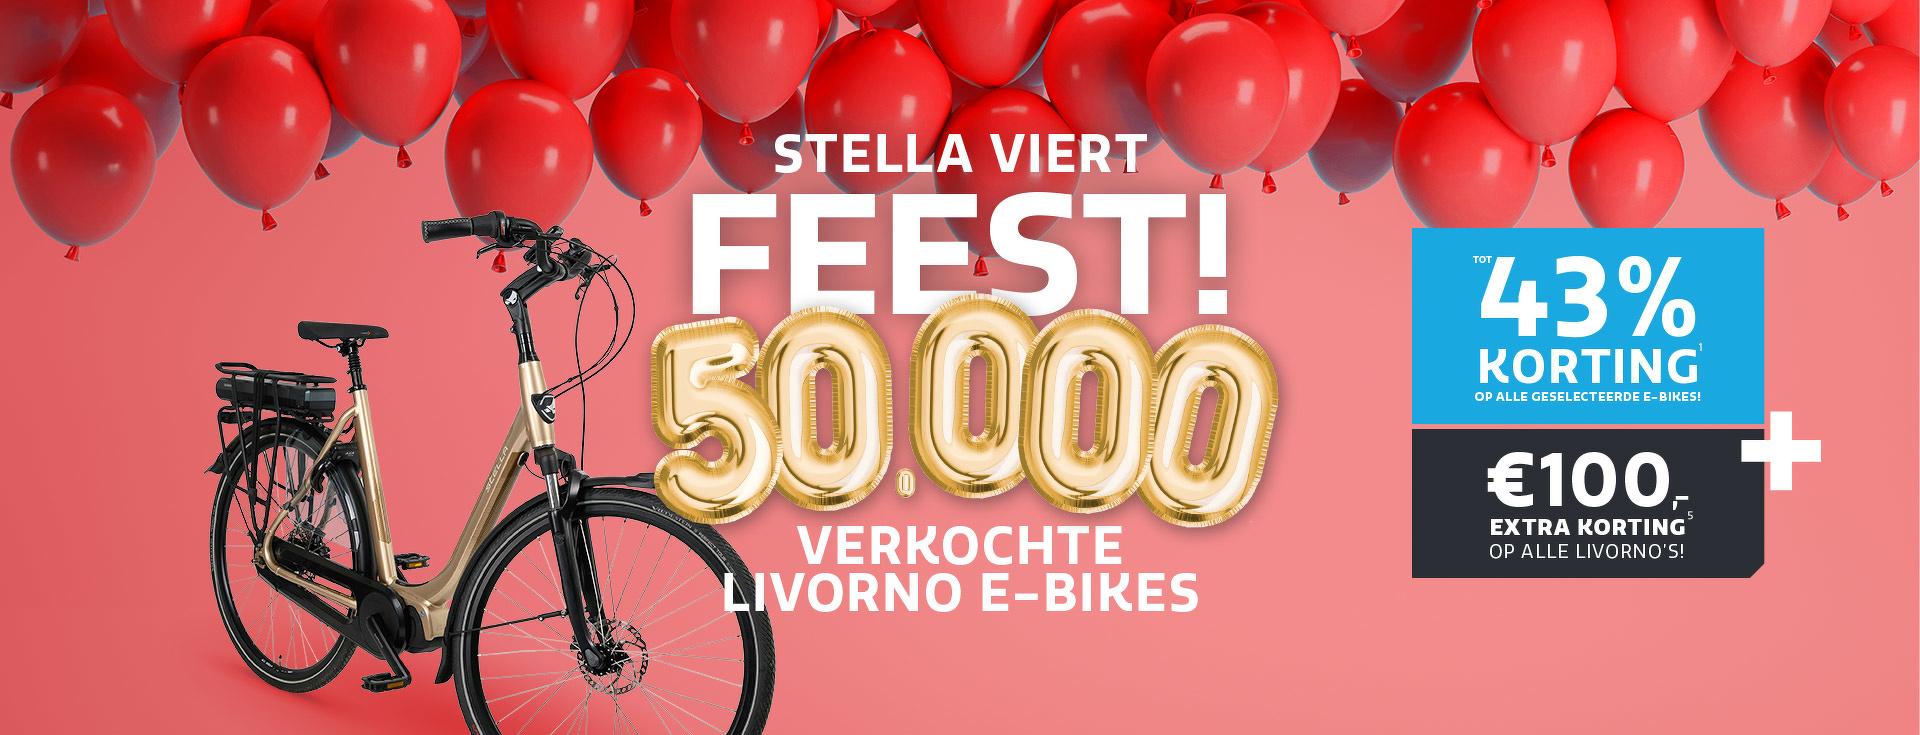 Al meer dan 50.000 Livorno's verkocht!